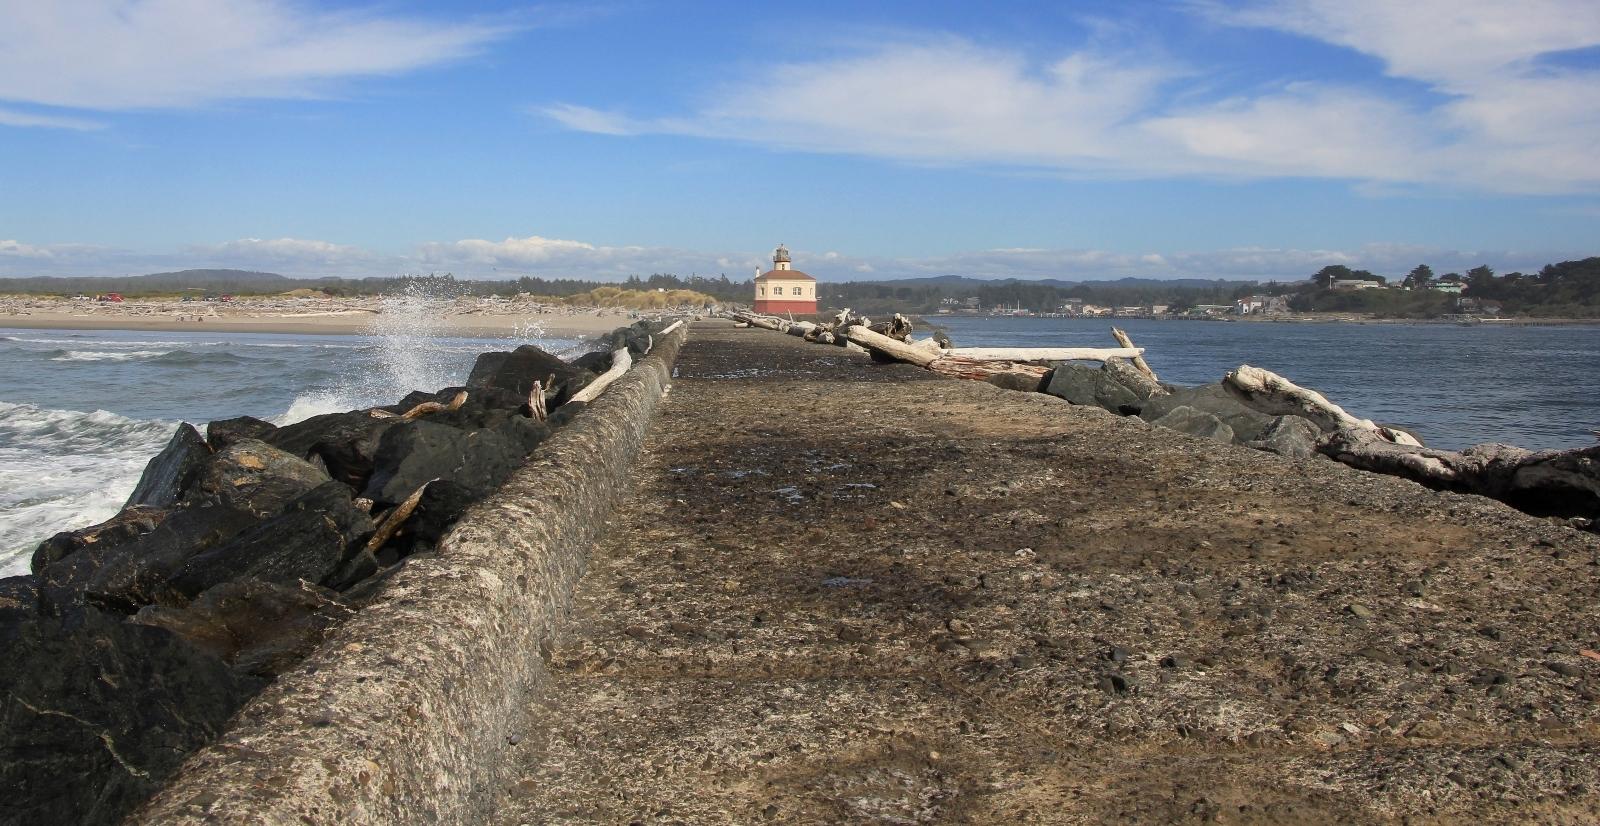 09-04-16-oregon-coast-shore-acres-196